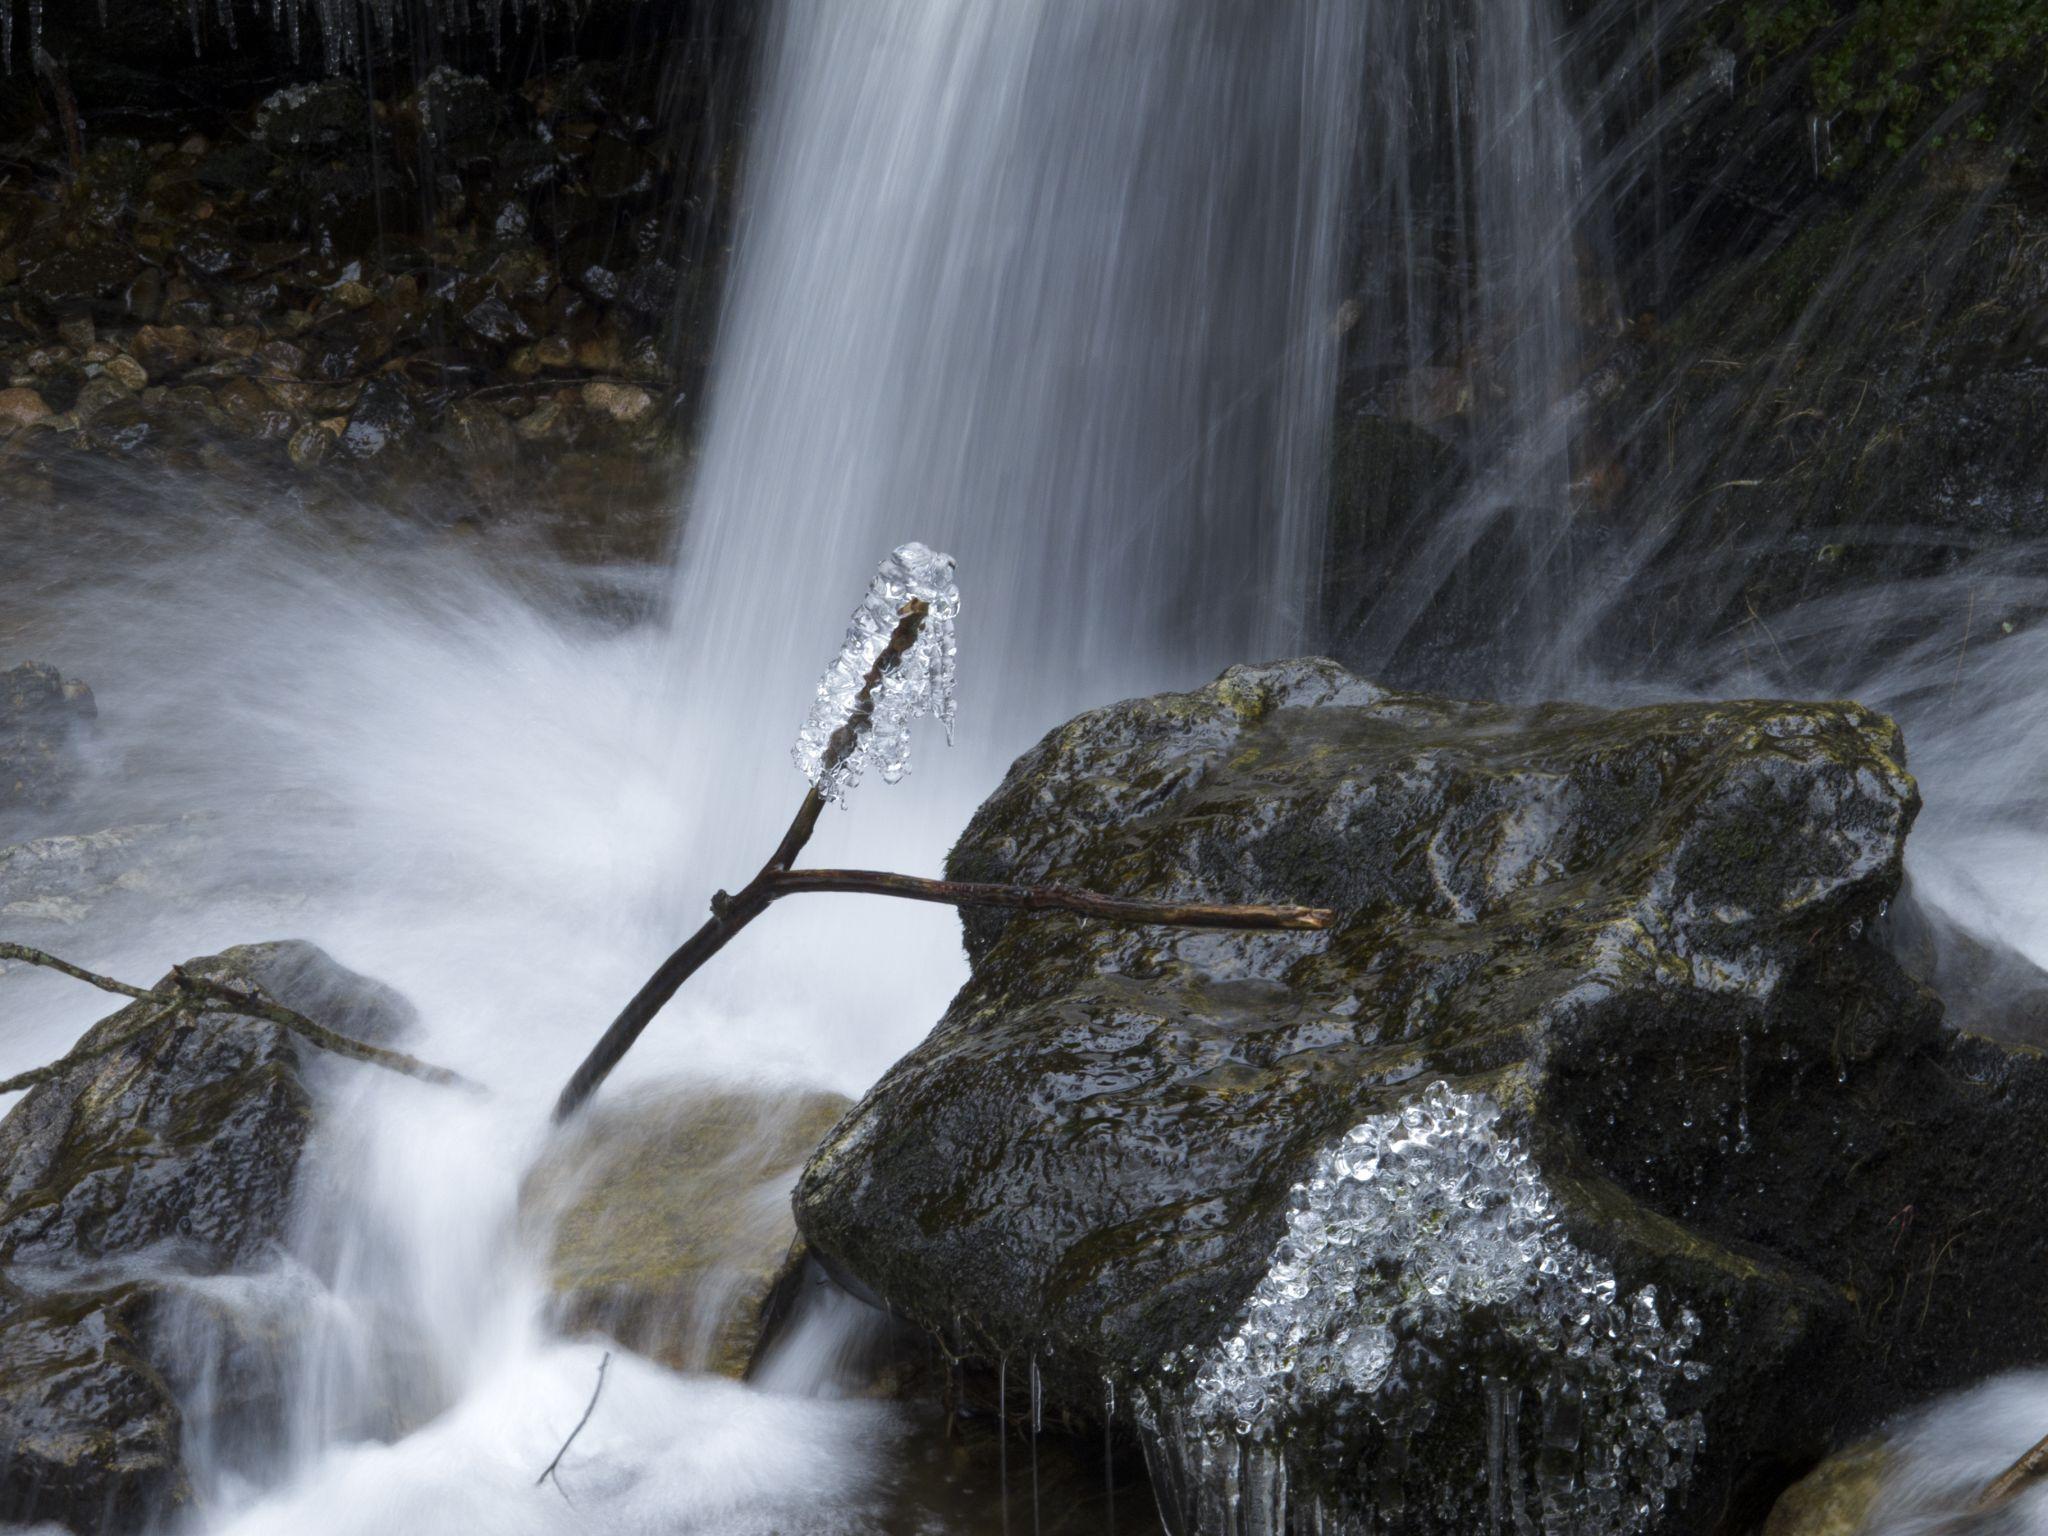 Todnauer Wasserfall, Germany